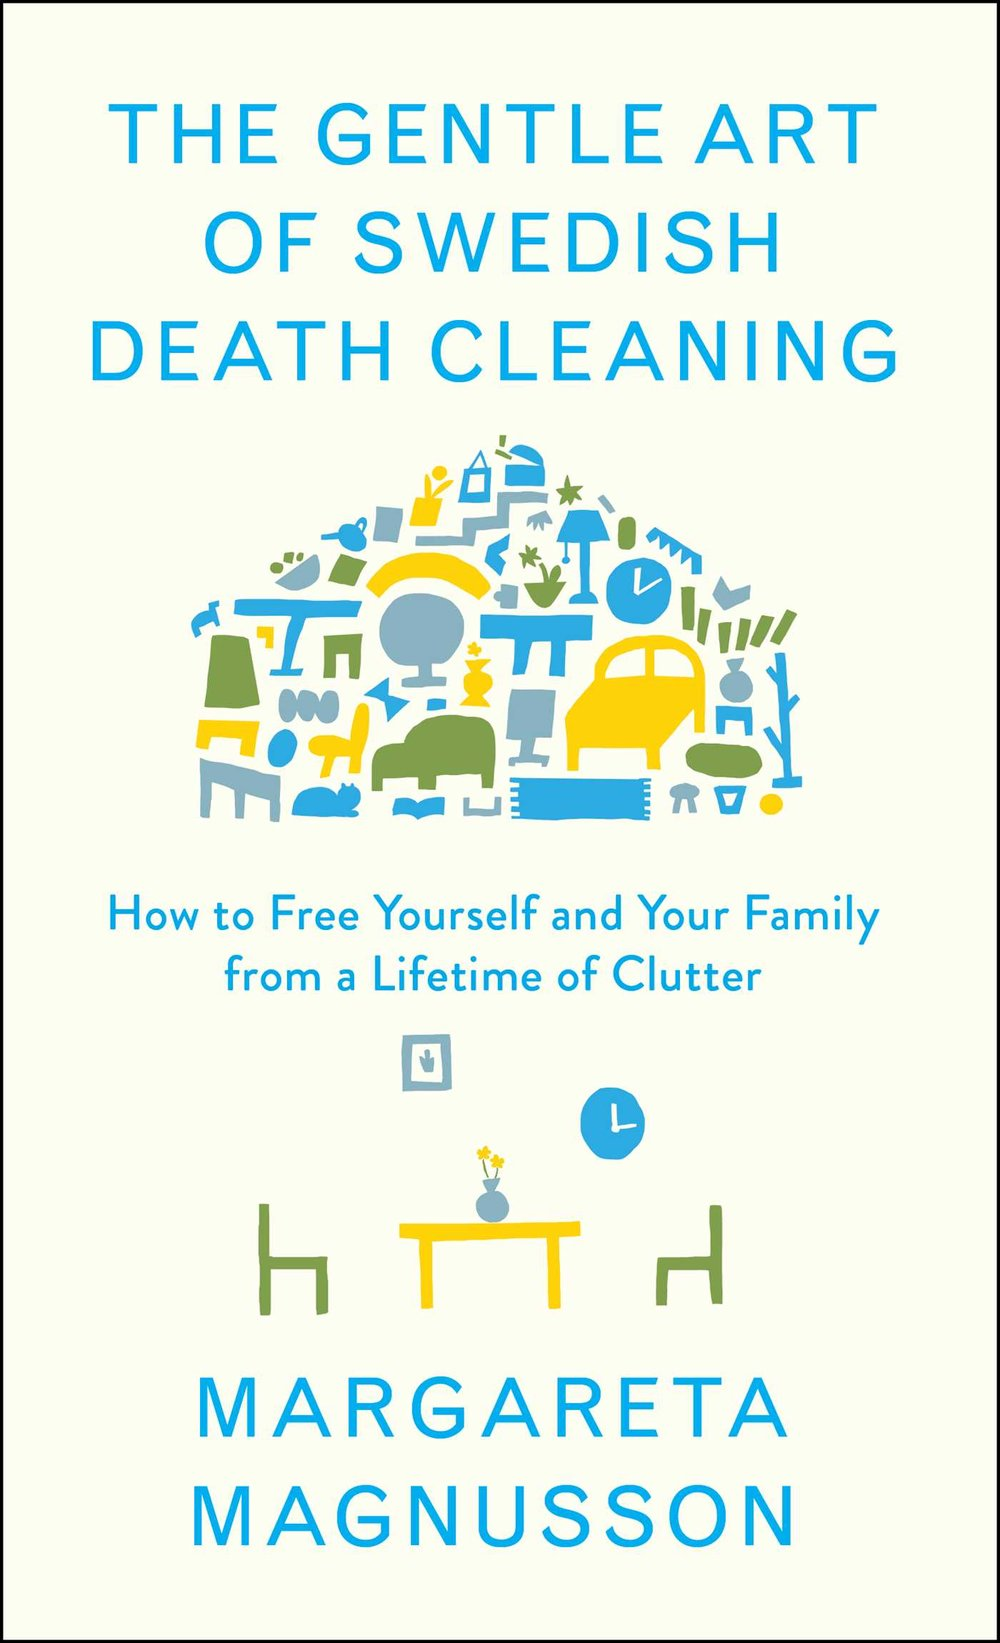 gentle_art_of_swedish_death_cleaning.jpg